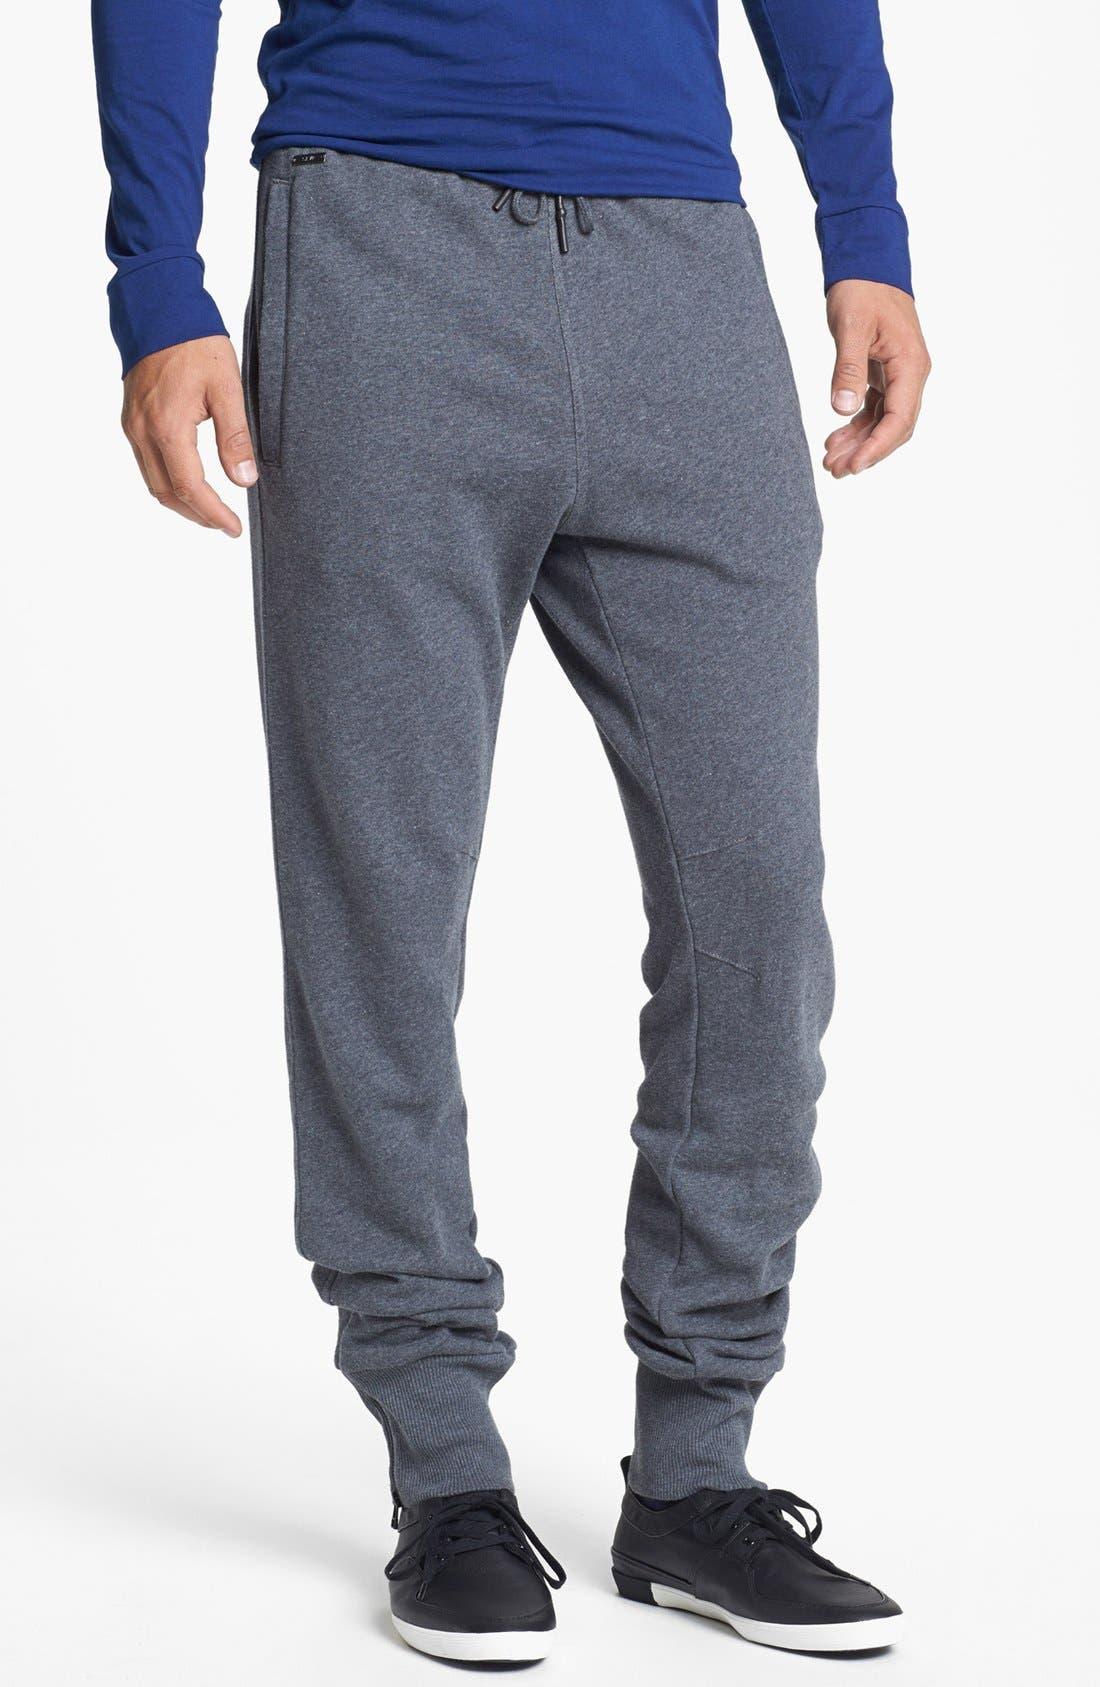 Main Image - adidas SLVR Slim Fit Pants